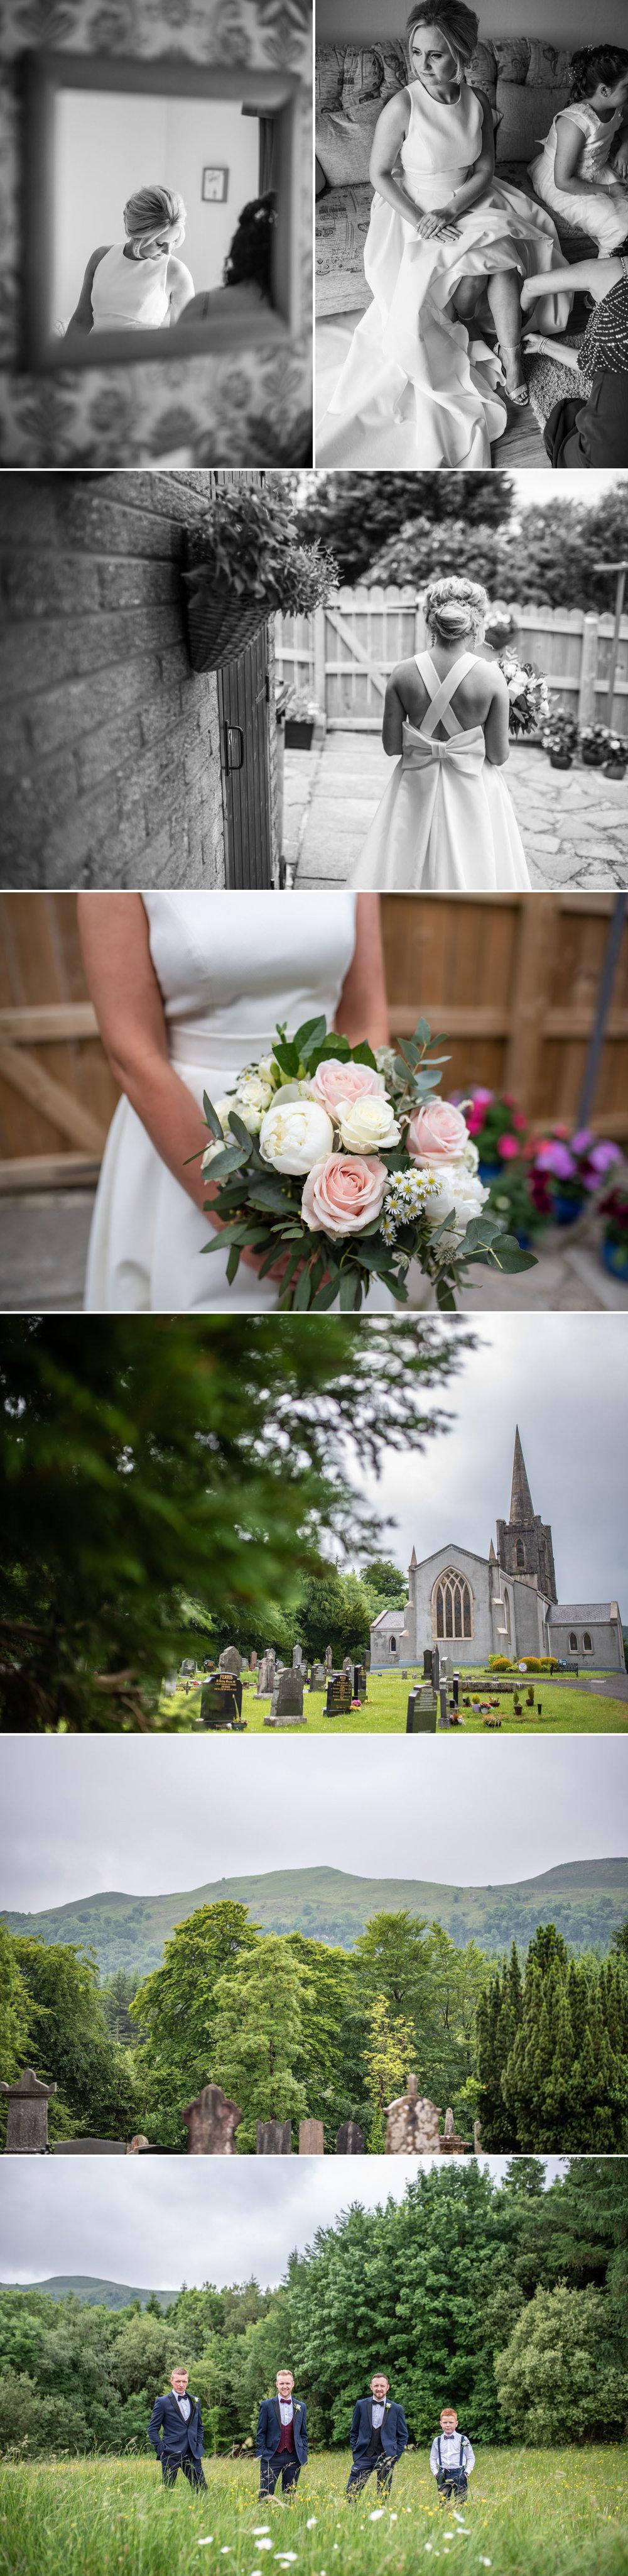 best wedding photographers northern ireland 03.jpg